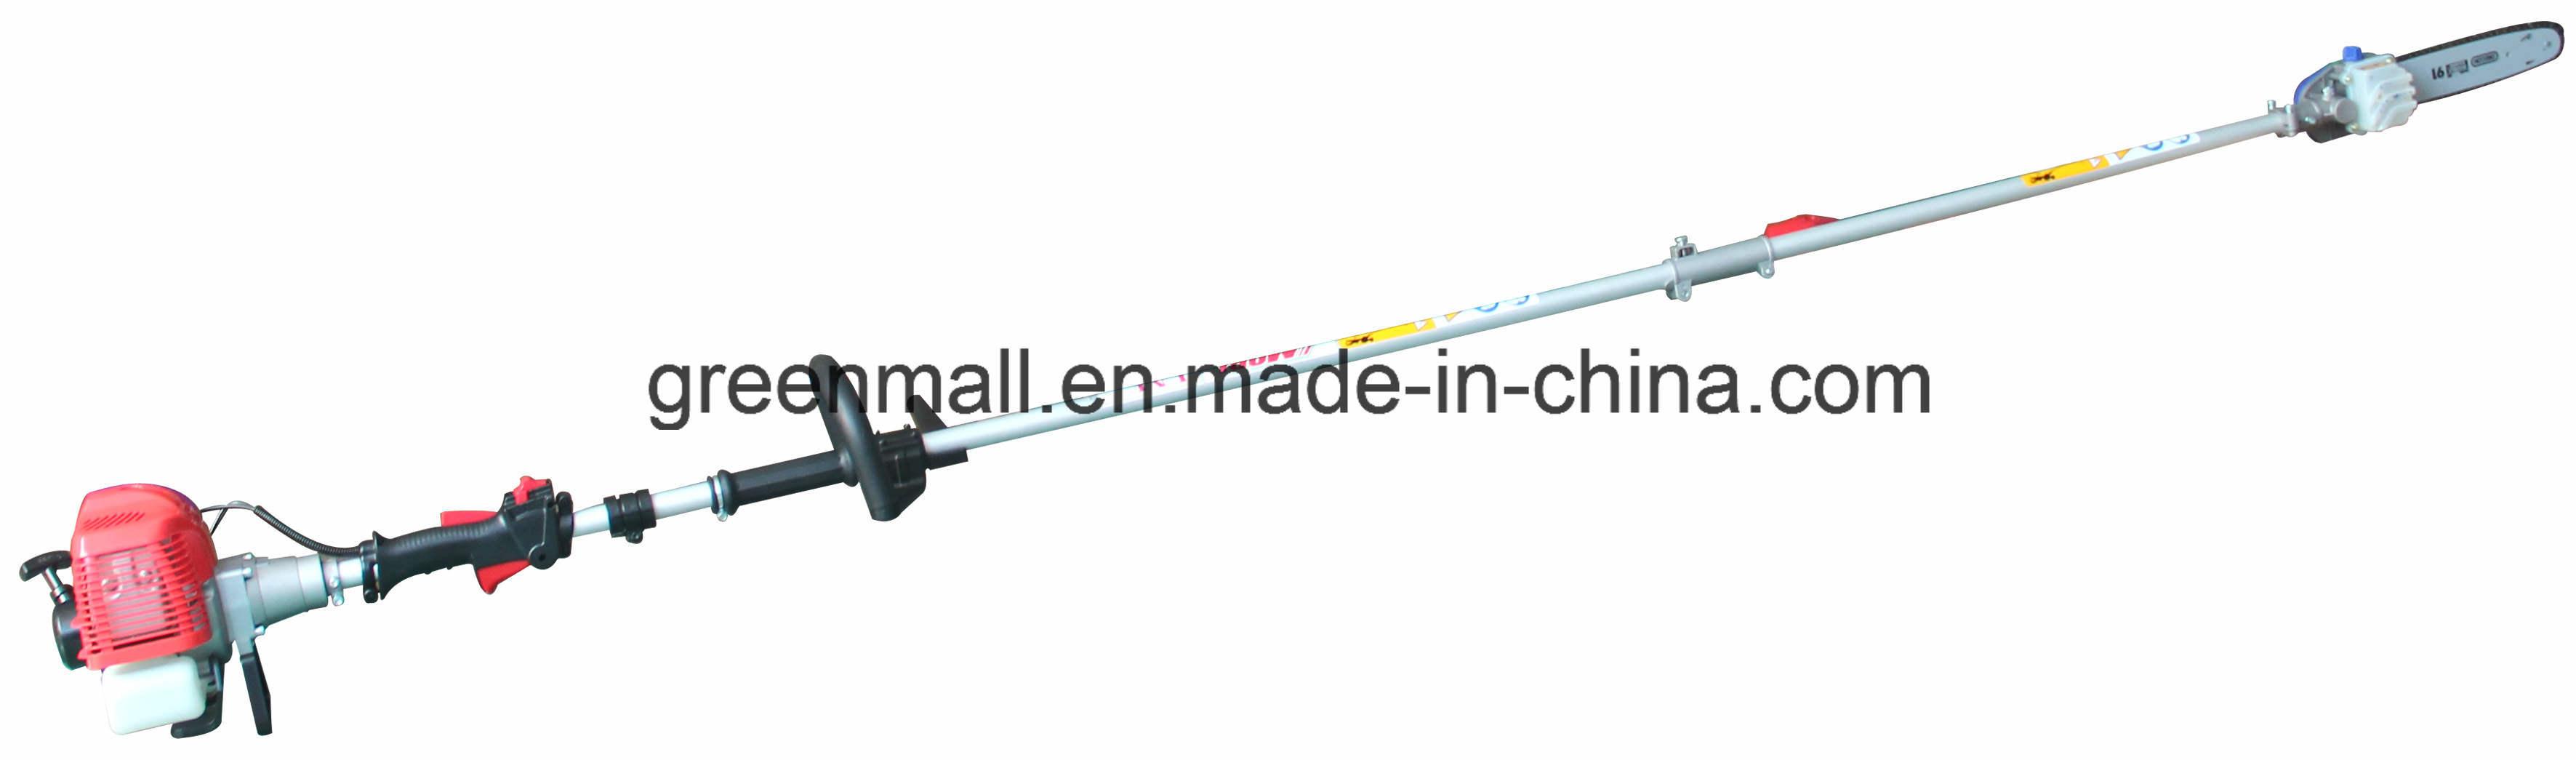 Pole Pruner Powered by Mitsubishi Engine (TU26) (GP-M26-01)